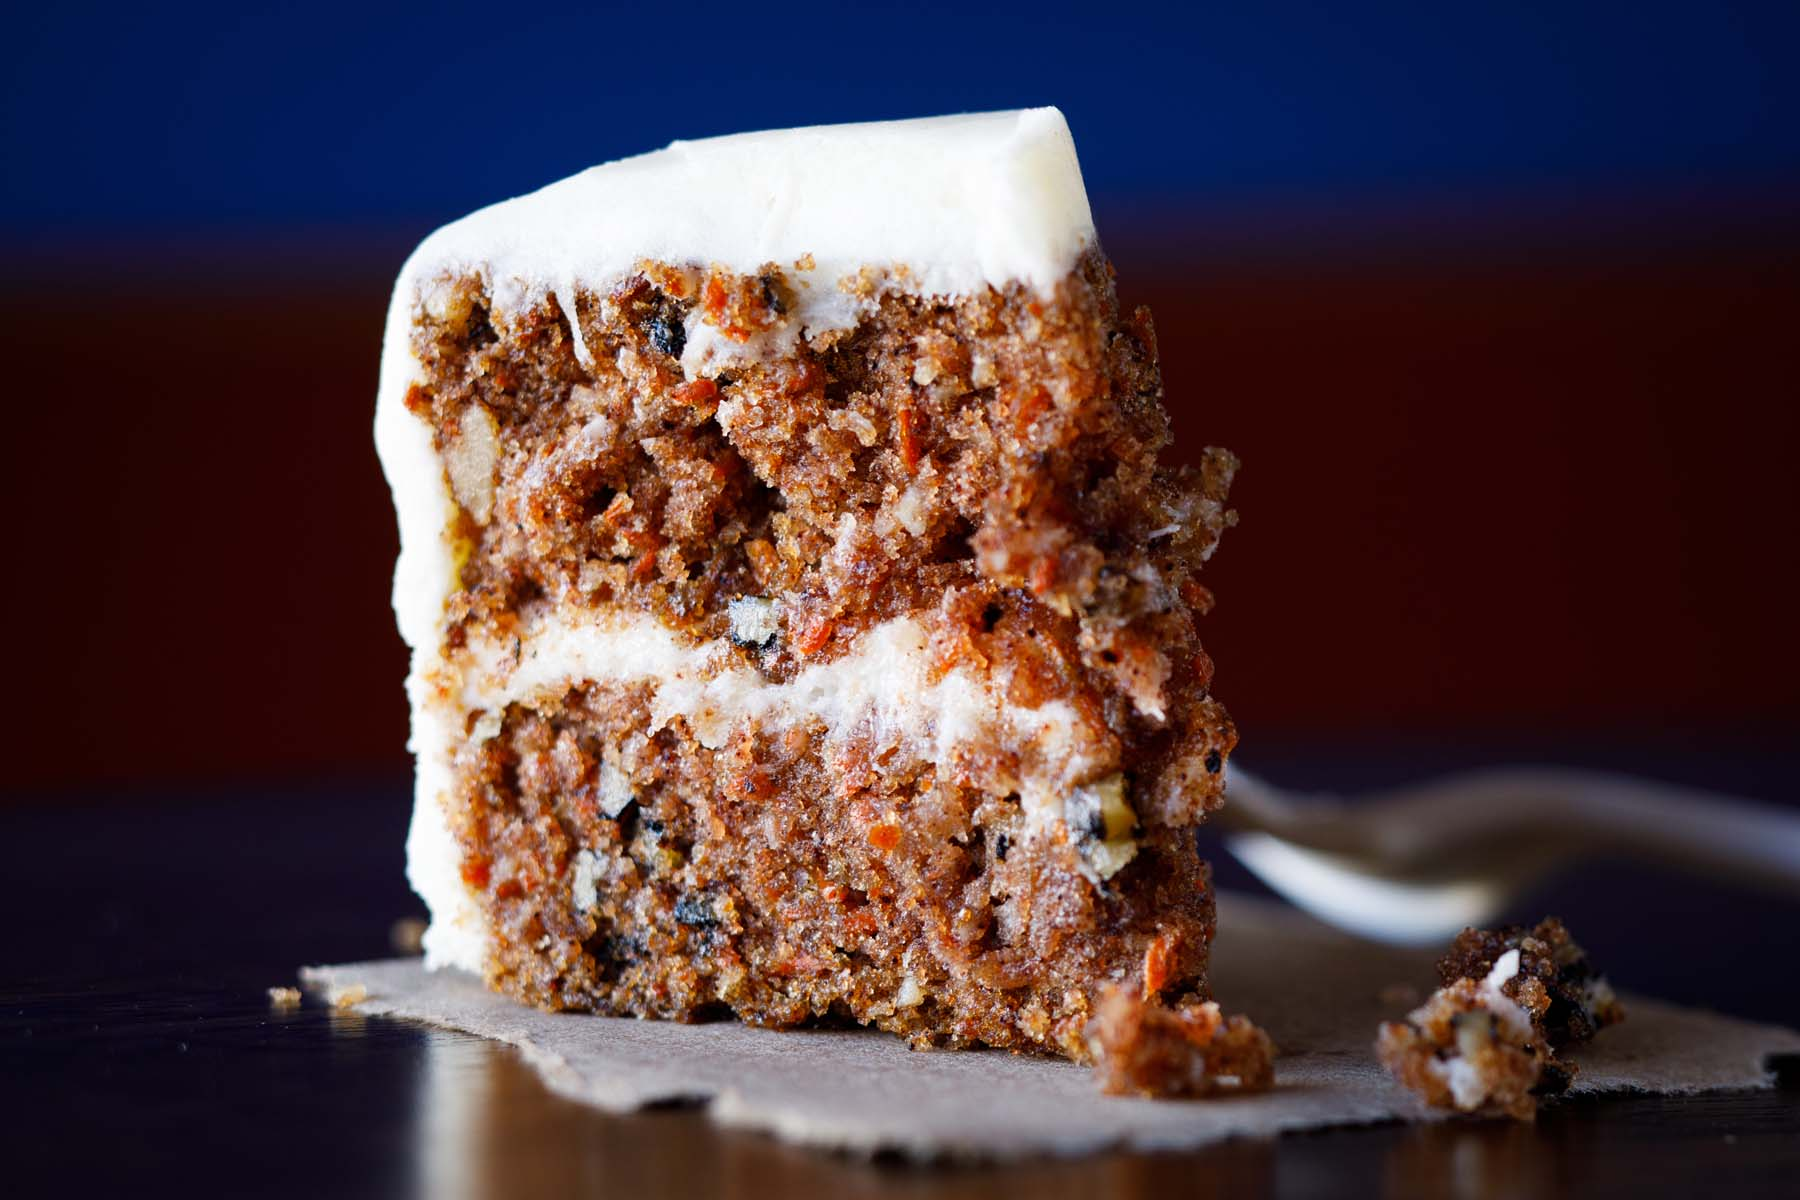 Best desserts in Wichita - Cake